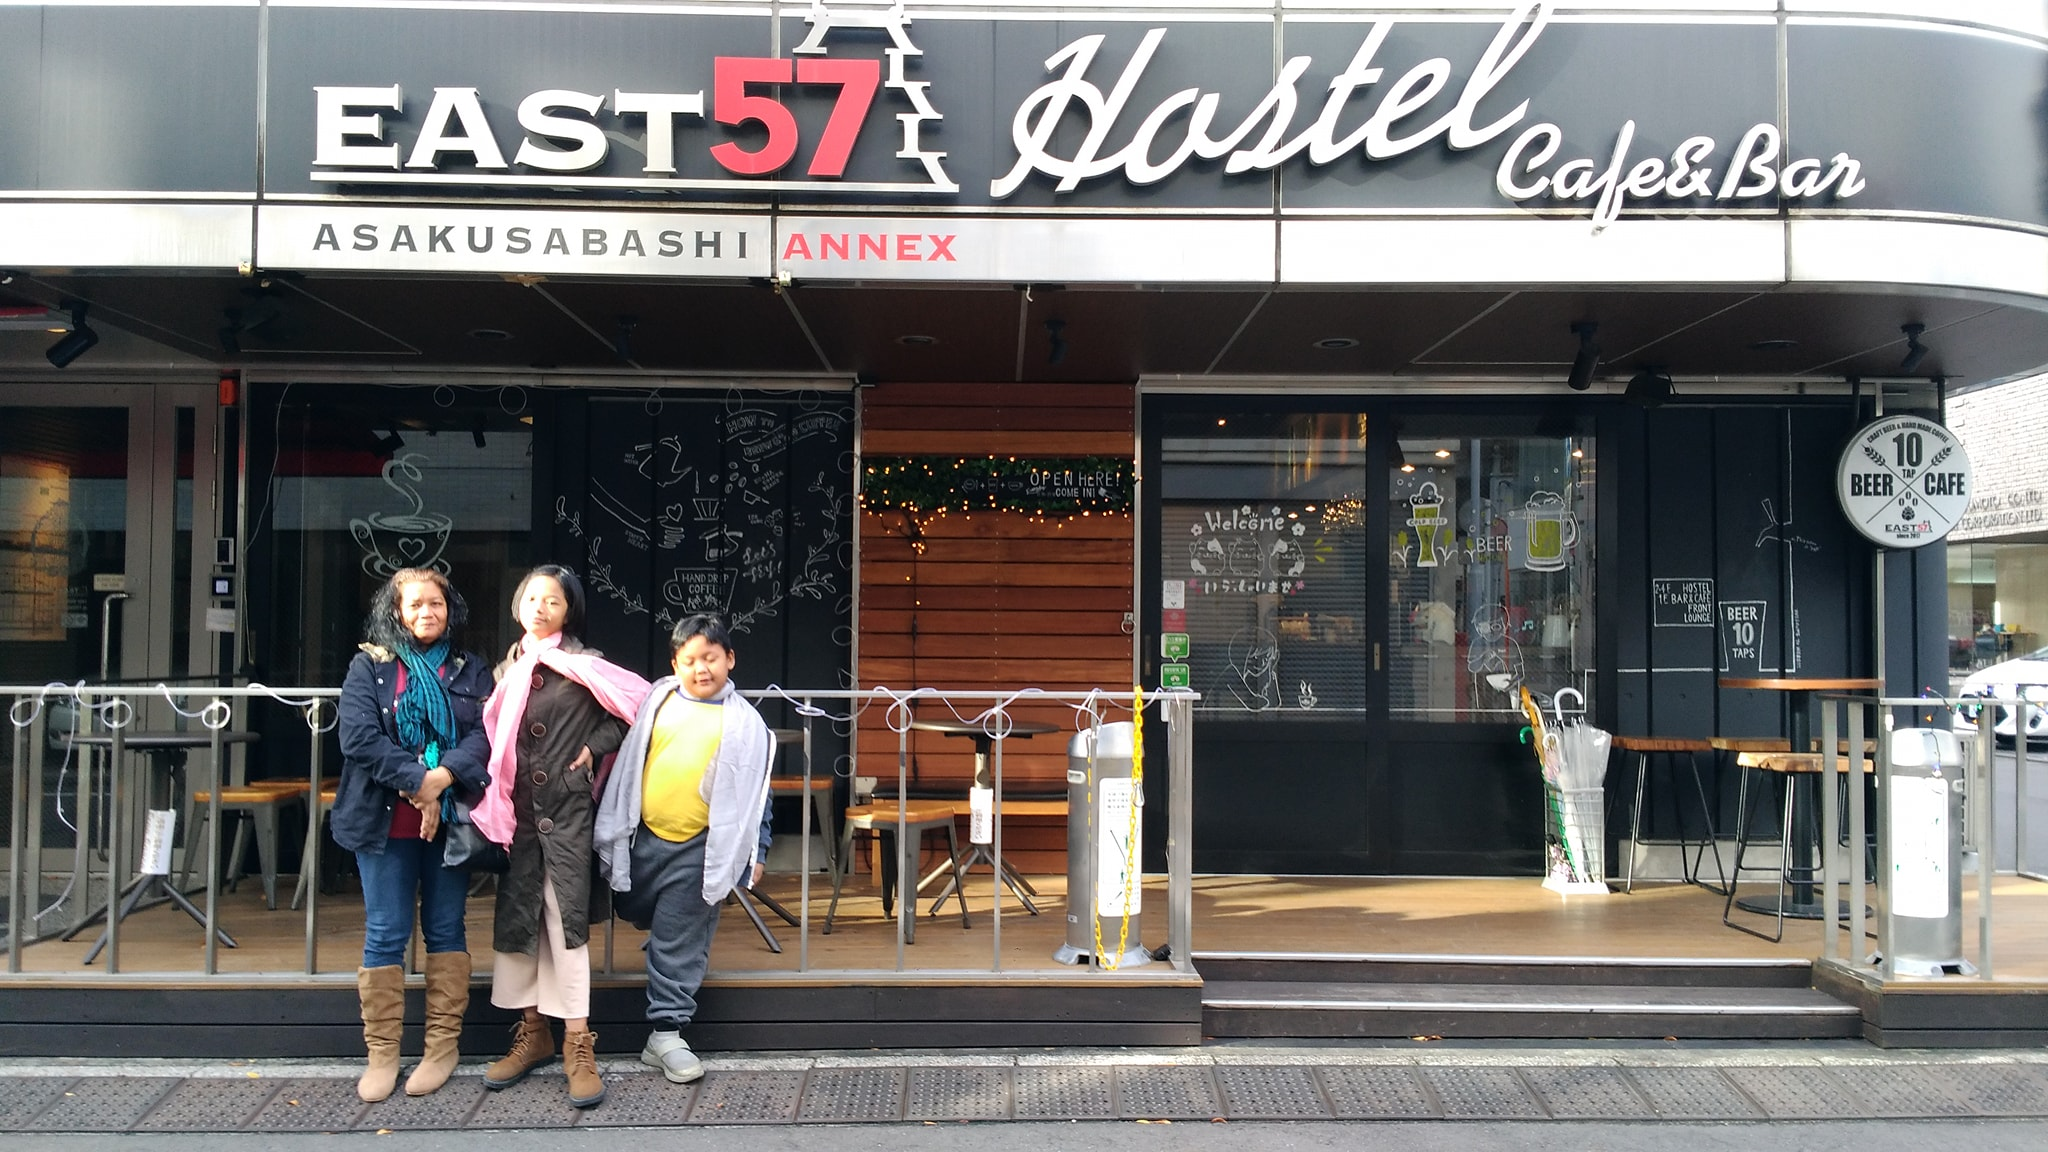 Hostel East57